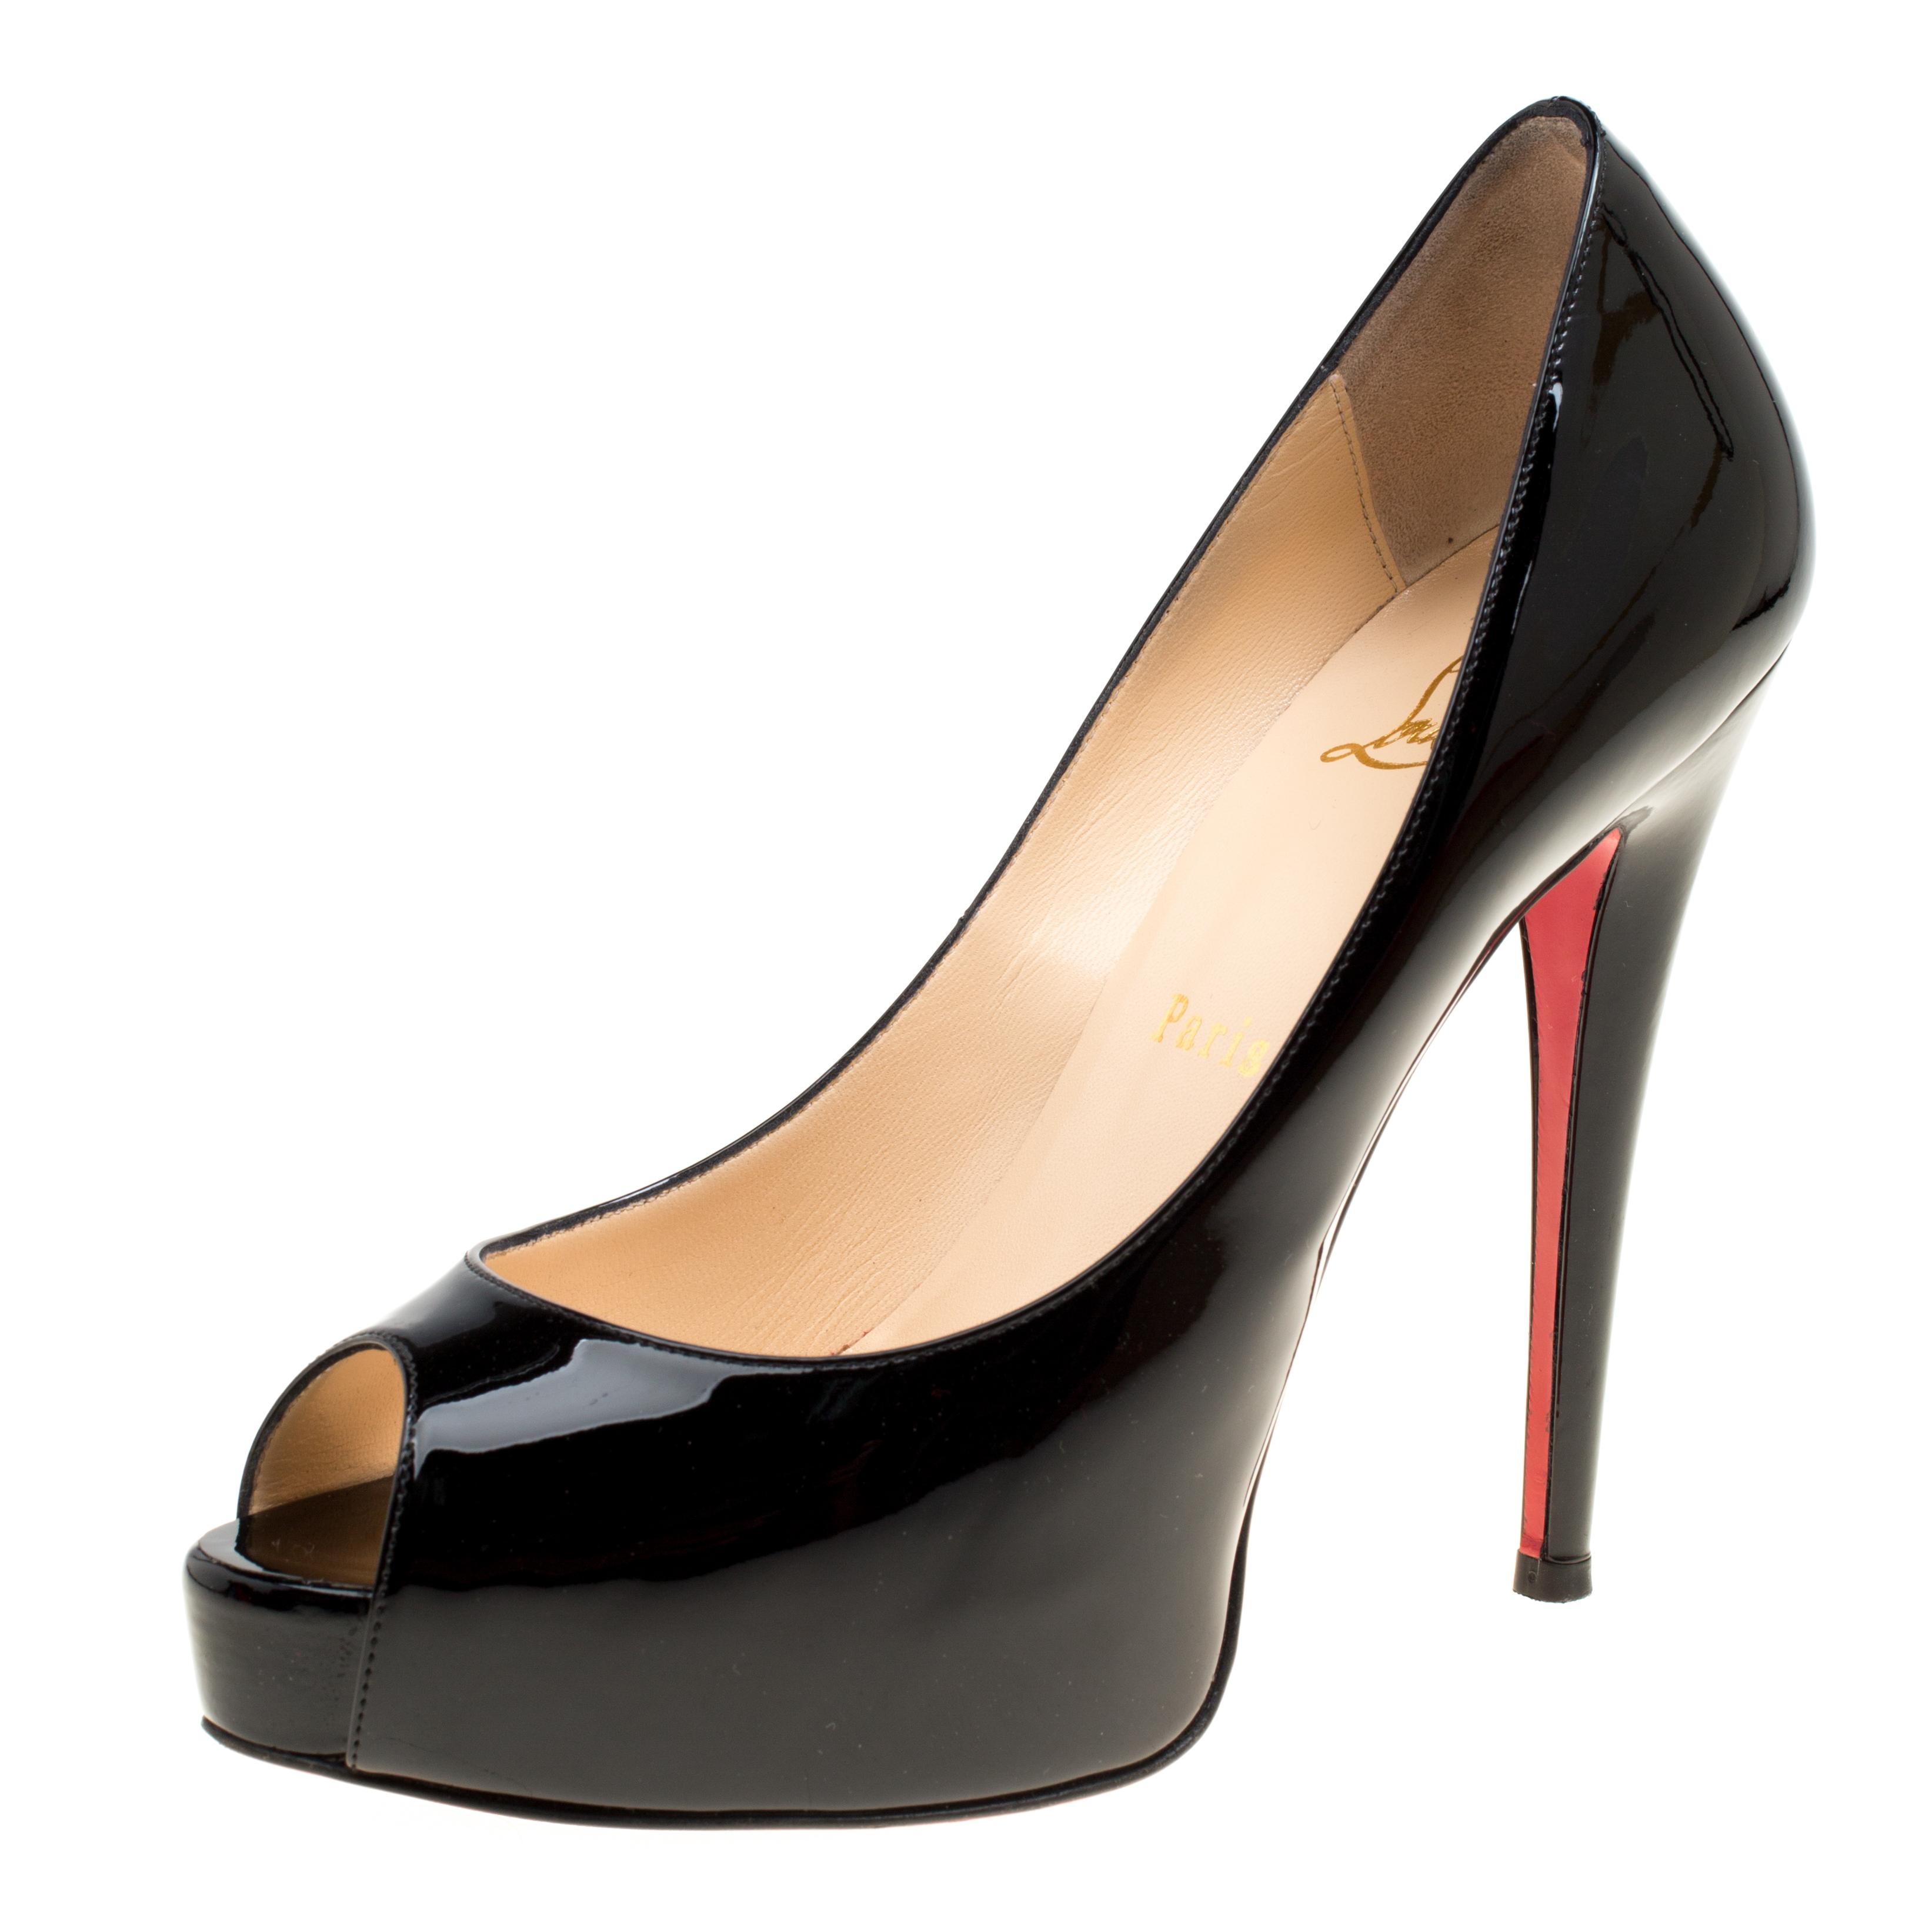 bea86c449fcb ... Christian Louboutin Black Patent Leather Hyper Prive Peep Toe Platform  Pumps Size 37. nextprev. prevnext